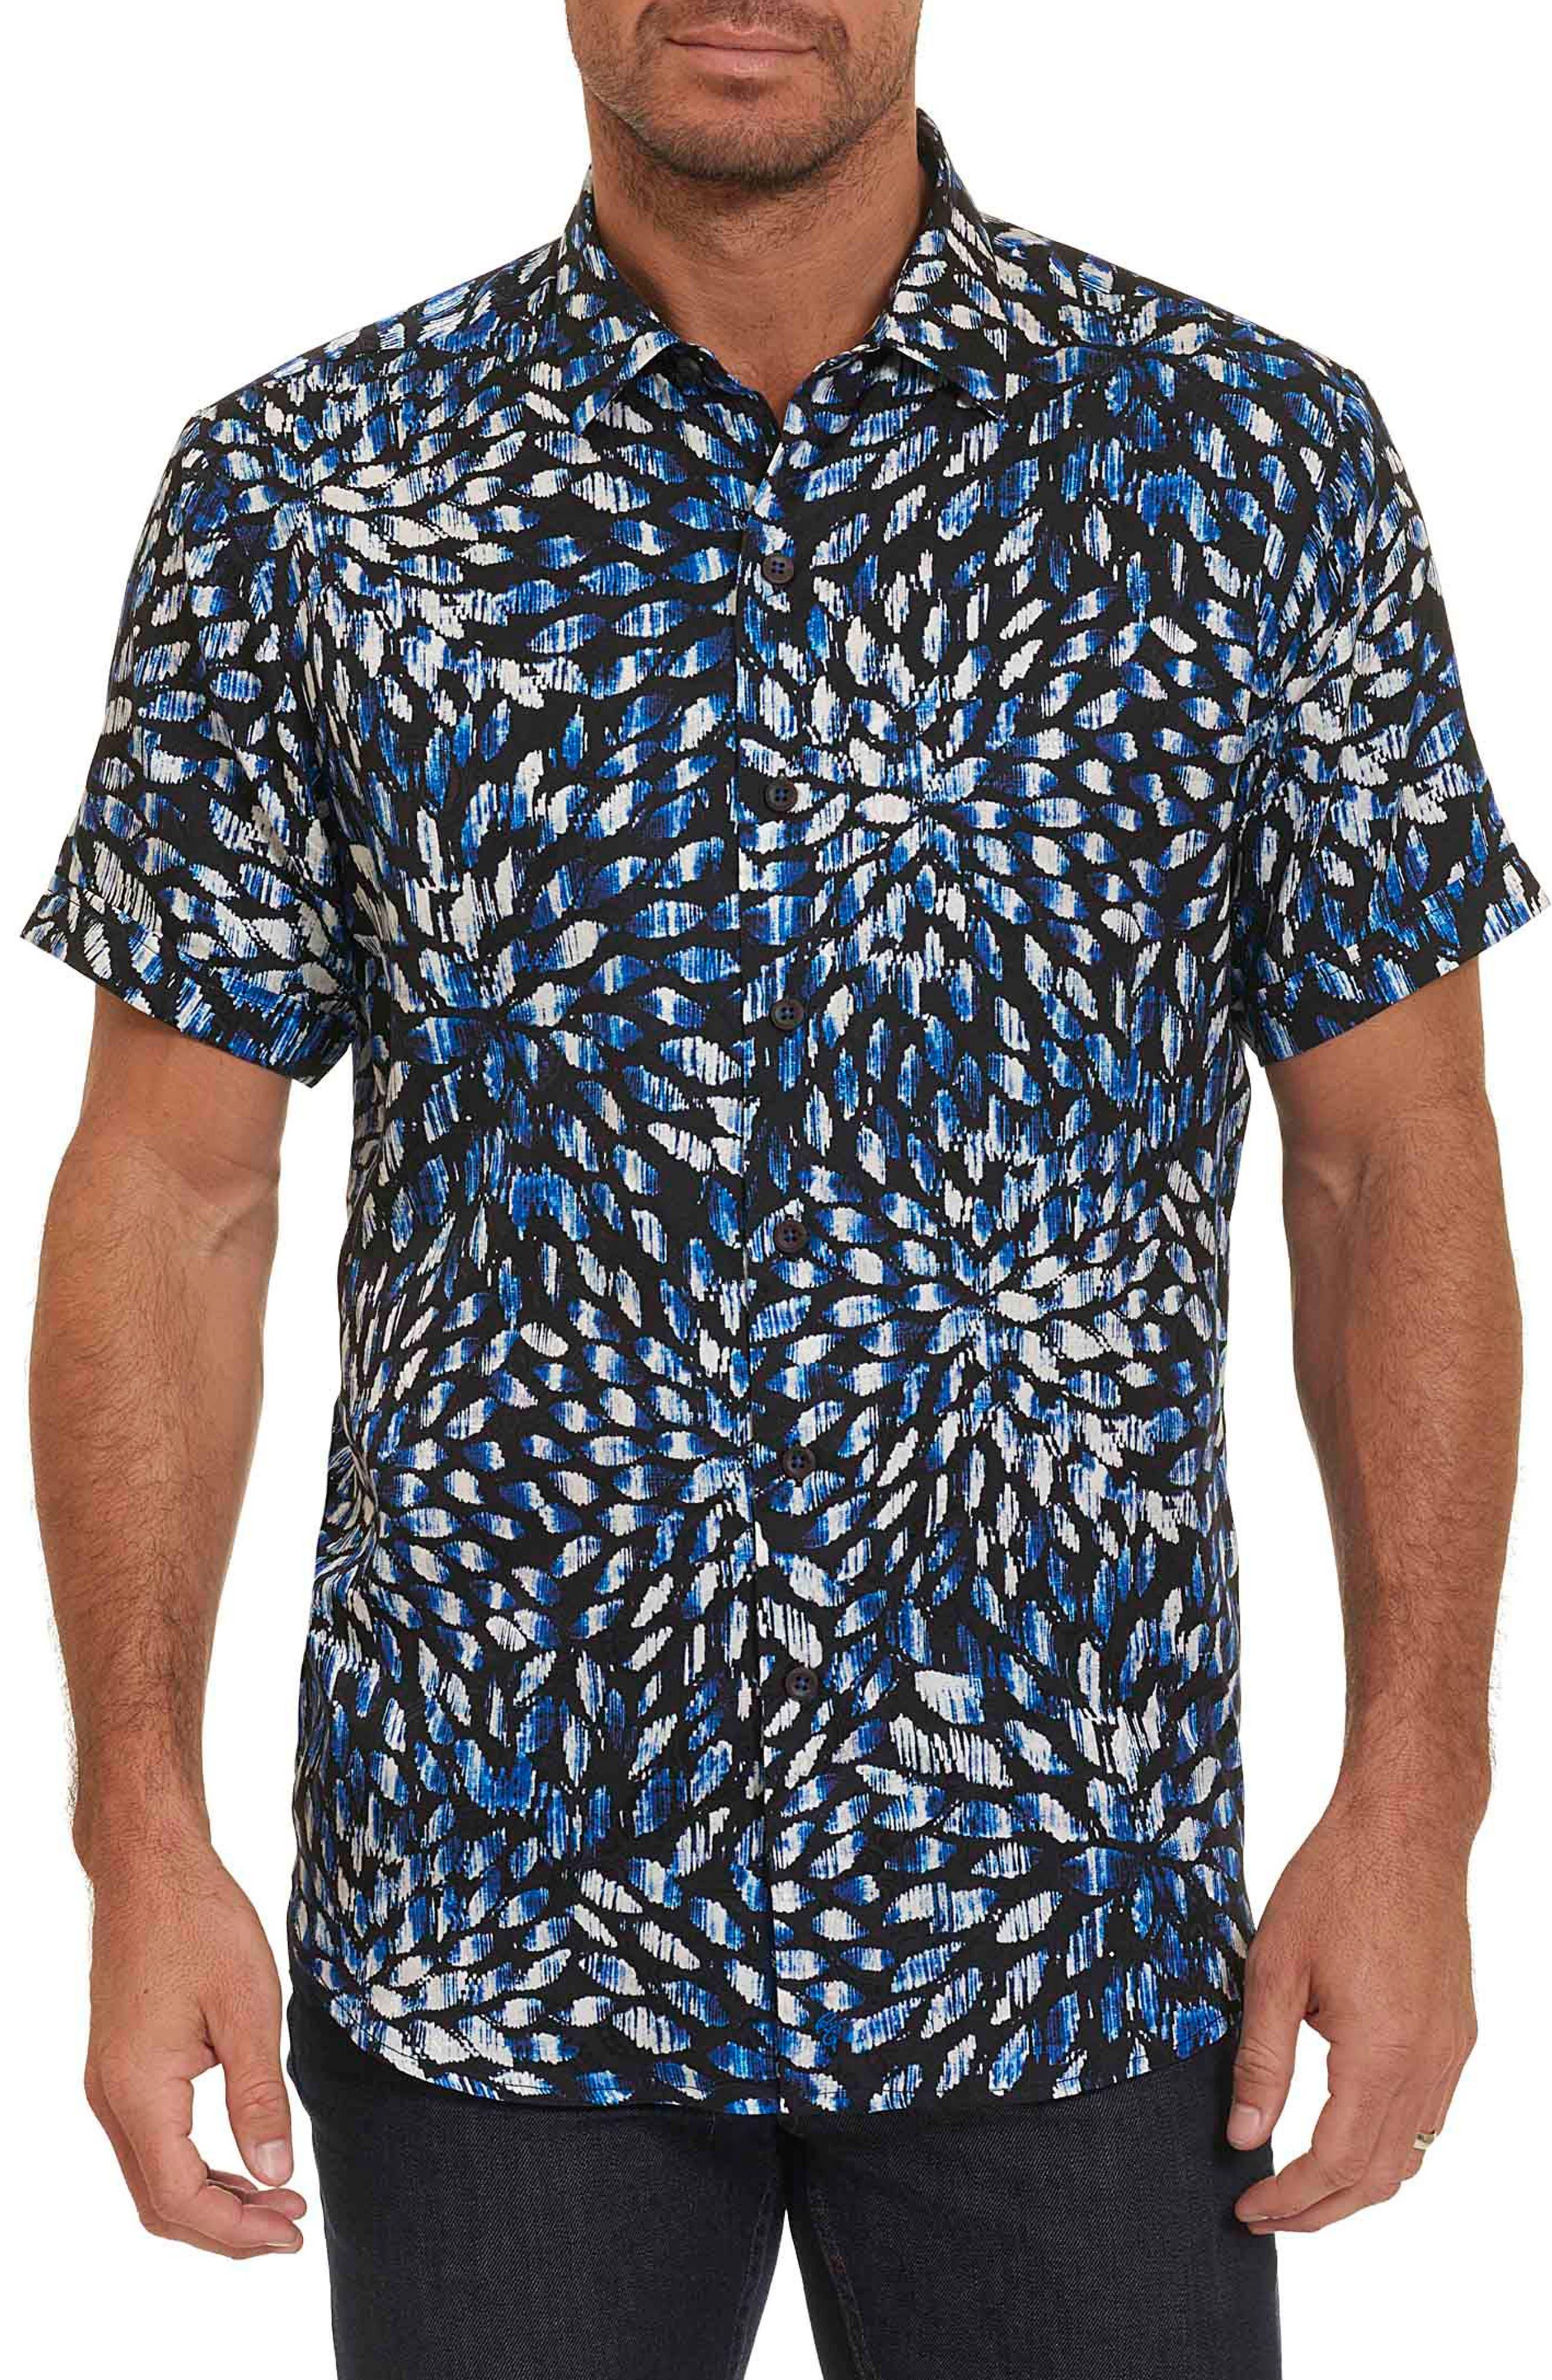 Alternate Image 1 Selected - Robert Graham Pebble Beach Print Short Sleeve Sport Shirt